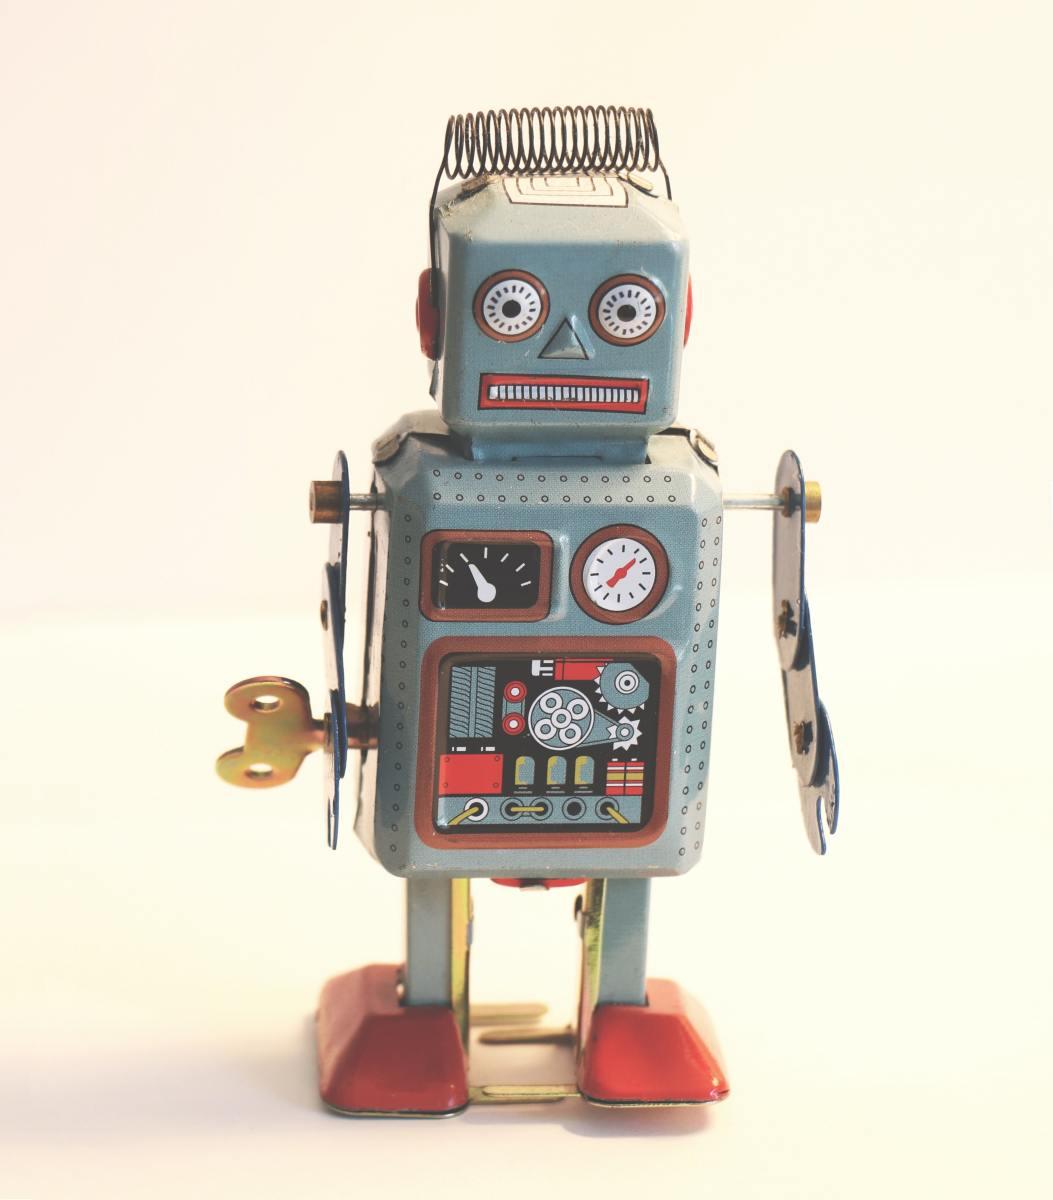 Robots can help make life a little bit easier for humans.